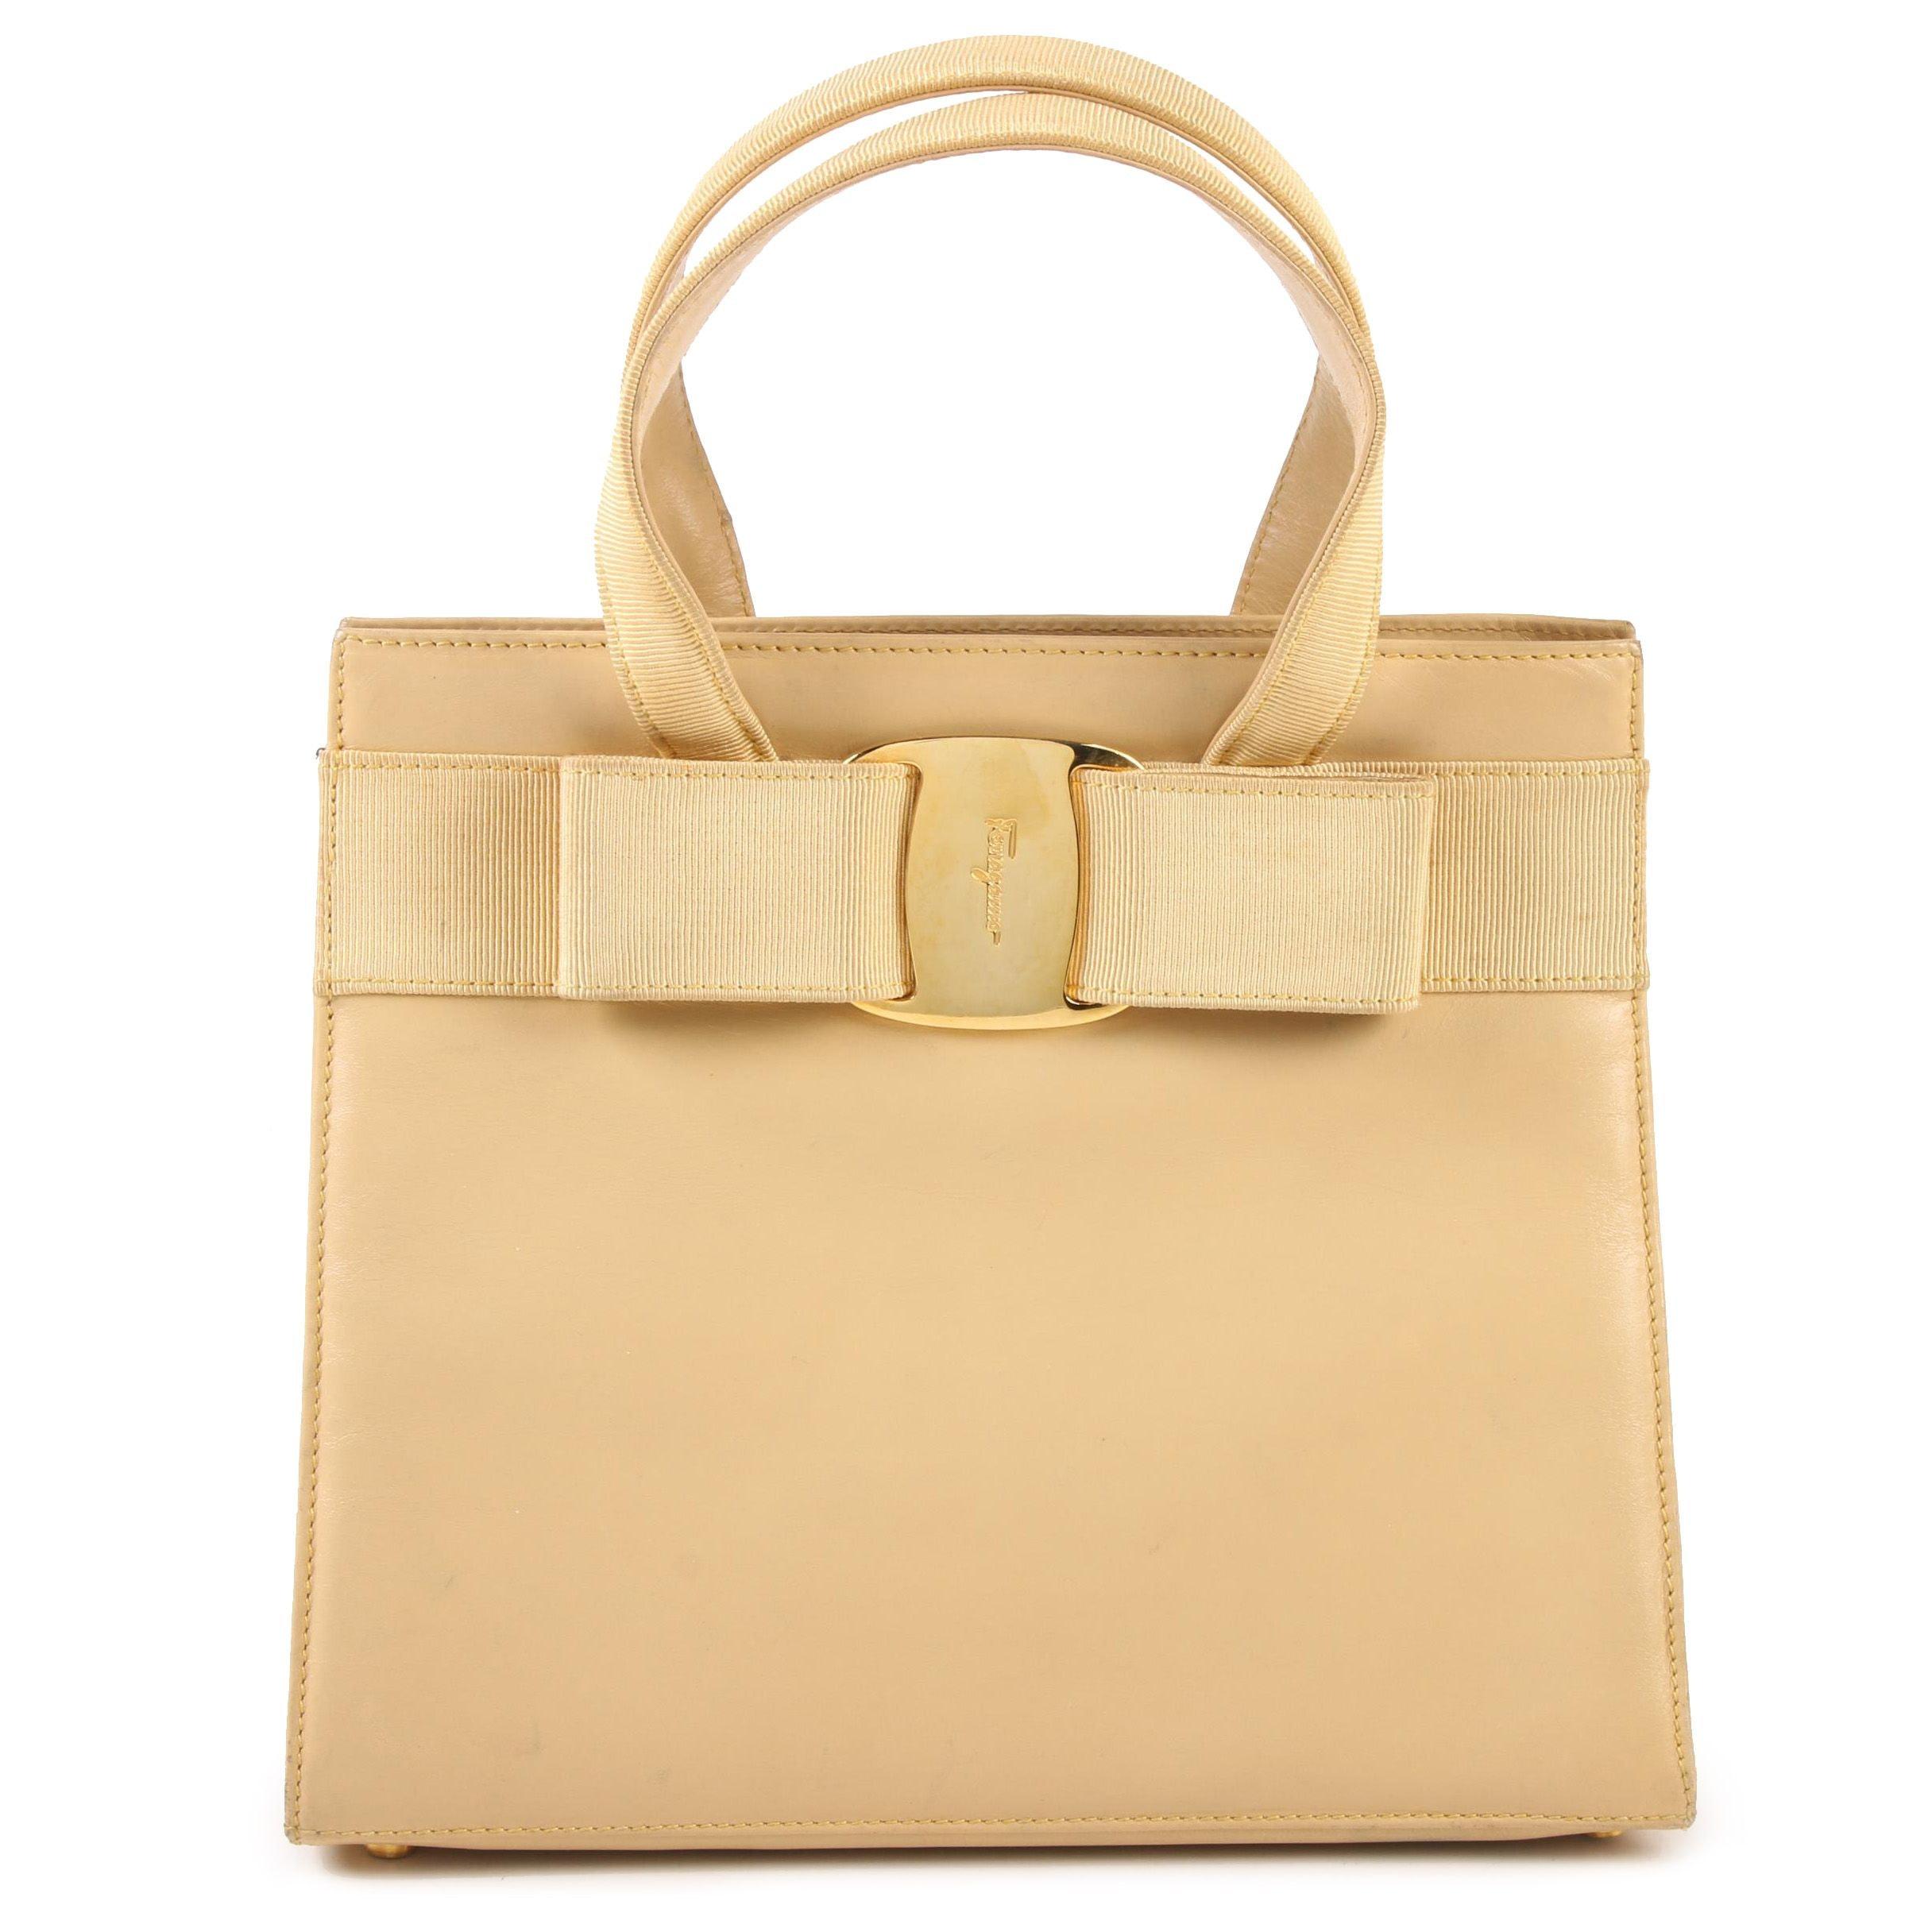 Salvatore Ferragamo Vara Bow Flax Leather Top Handle Bag, Vintage